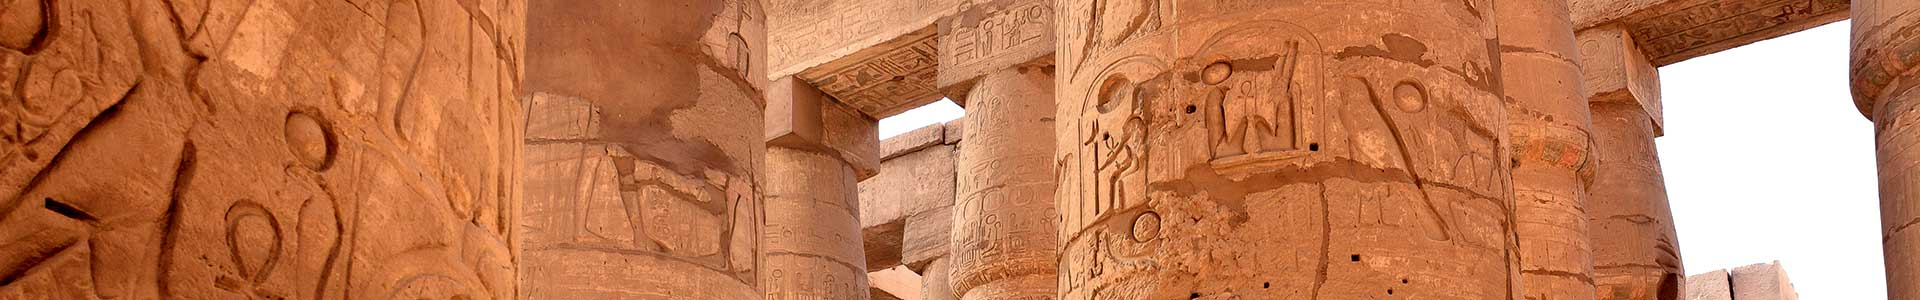 Voyage en Egypte - TUI